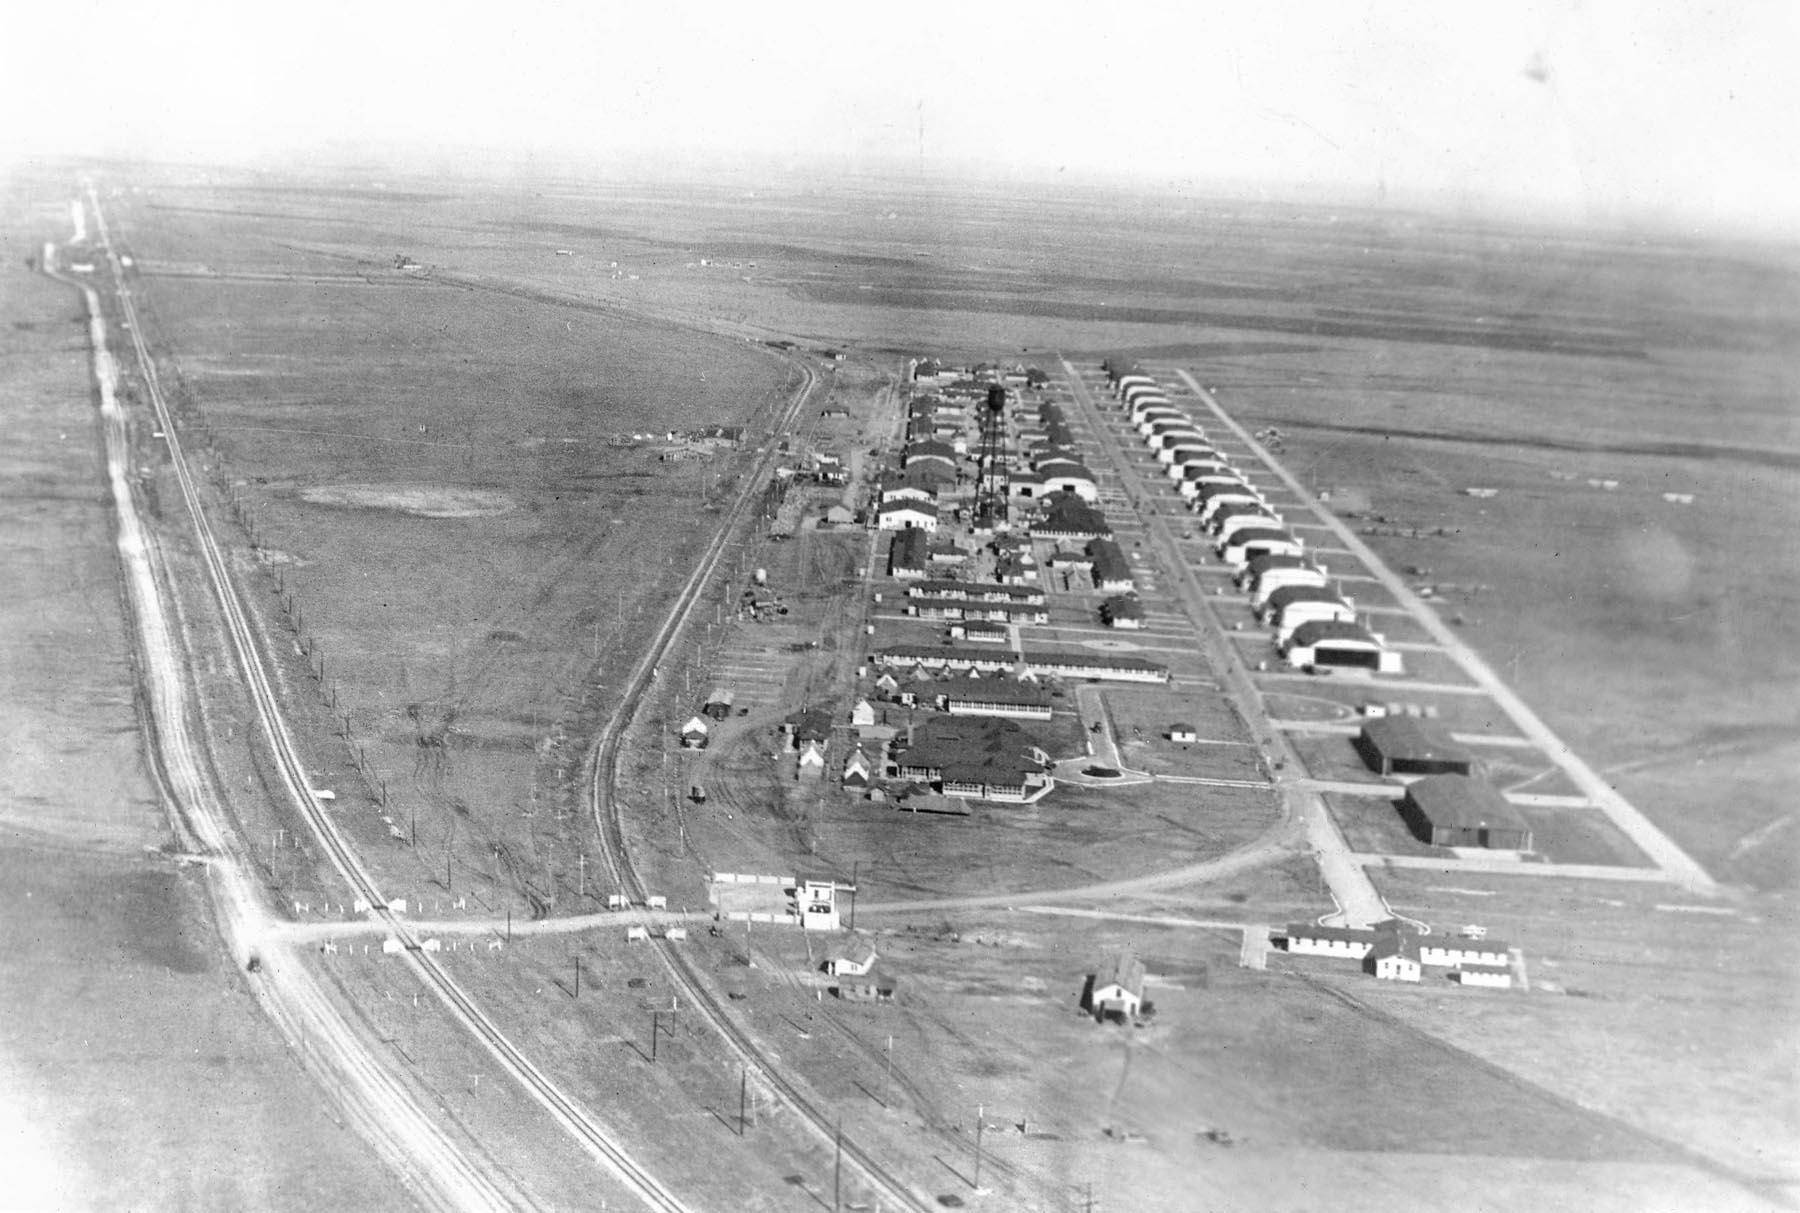 Hicks Field Fort Worth 1918